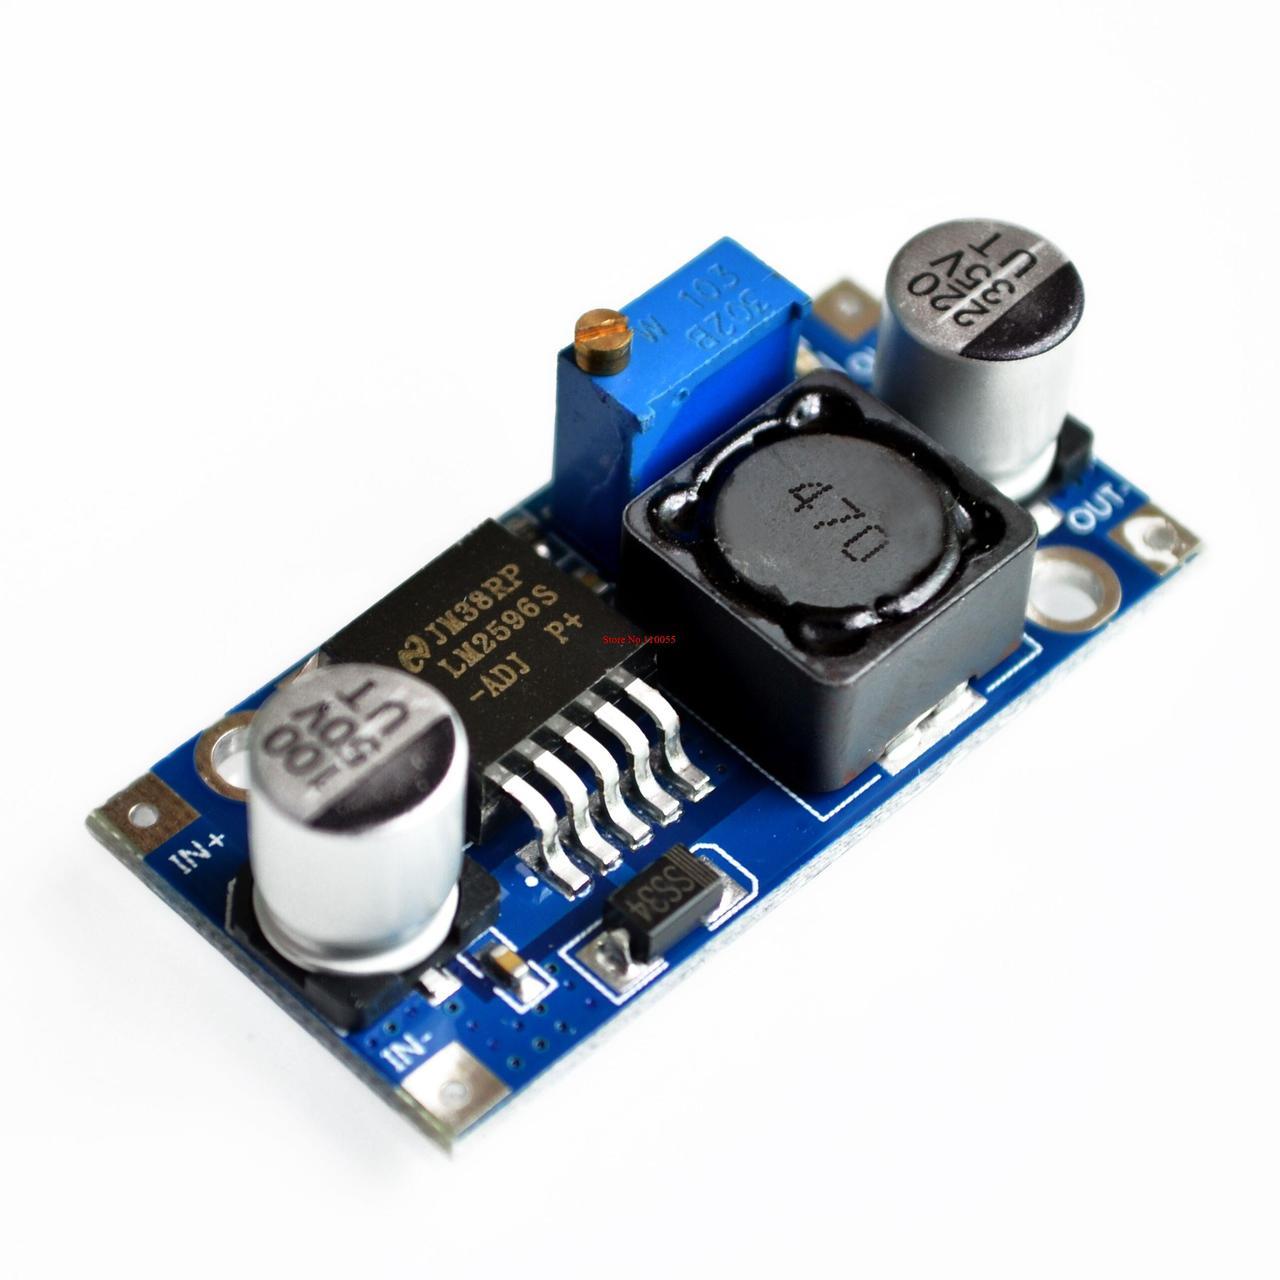 LM2596S стабилизатор регулируемый step down